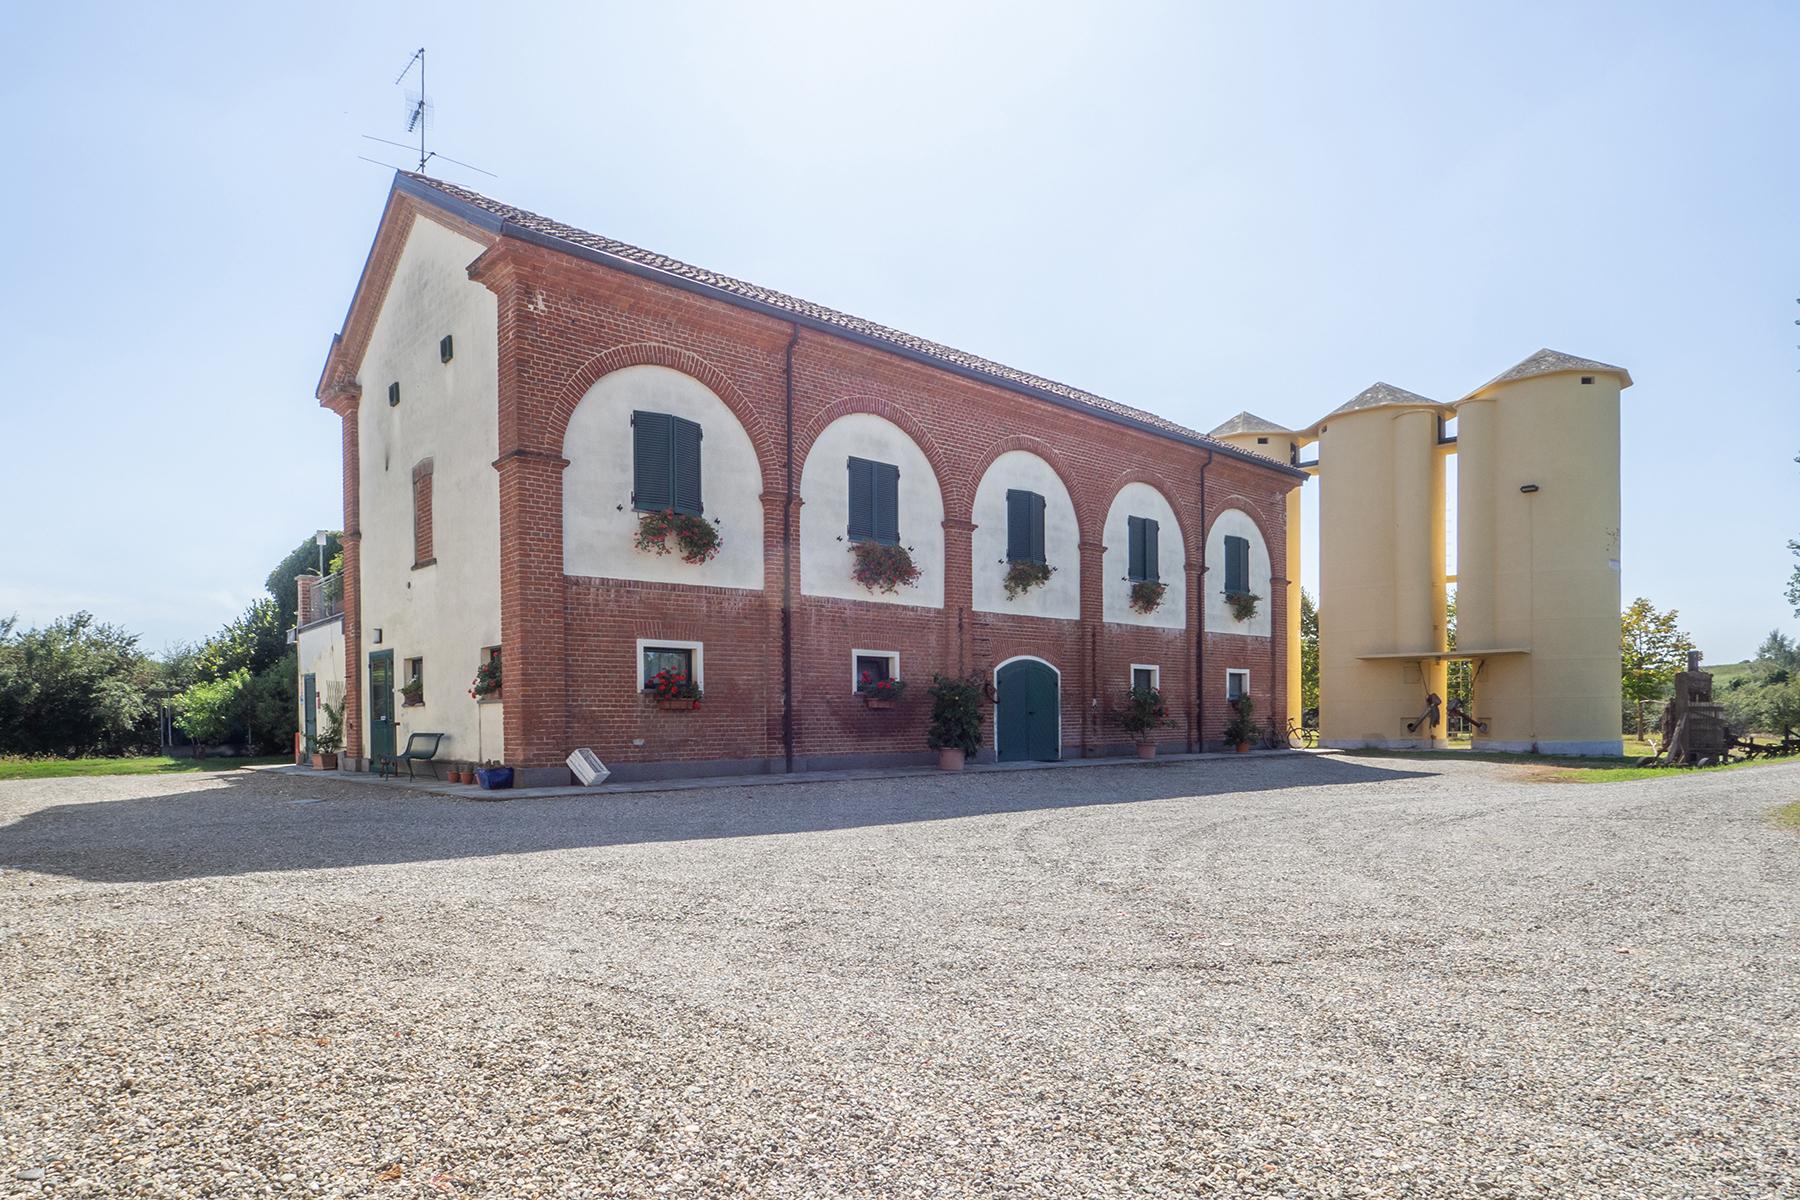 Rustico in Vendita a Valenza: 5 locali, 1800 mq - Foto 6